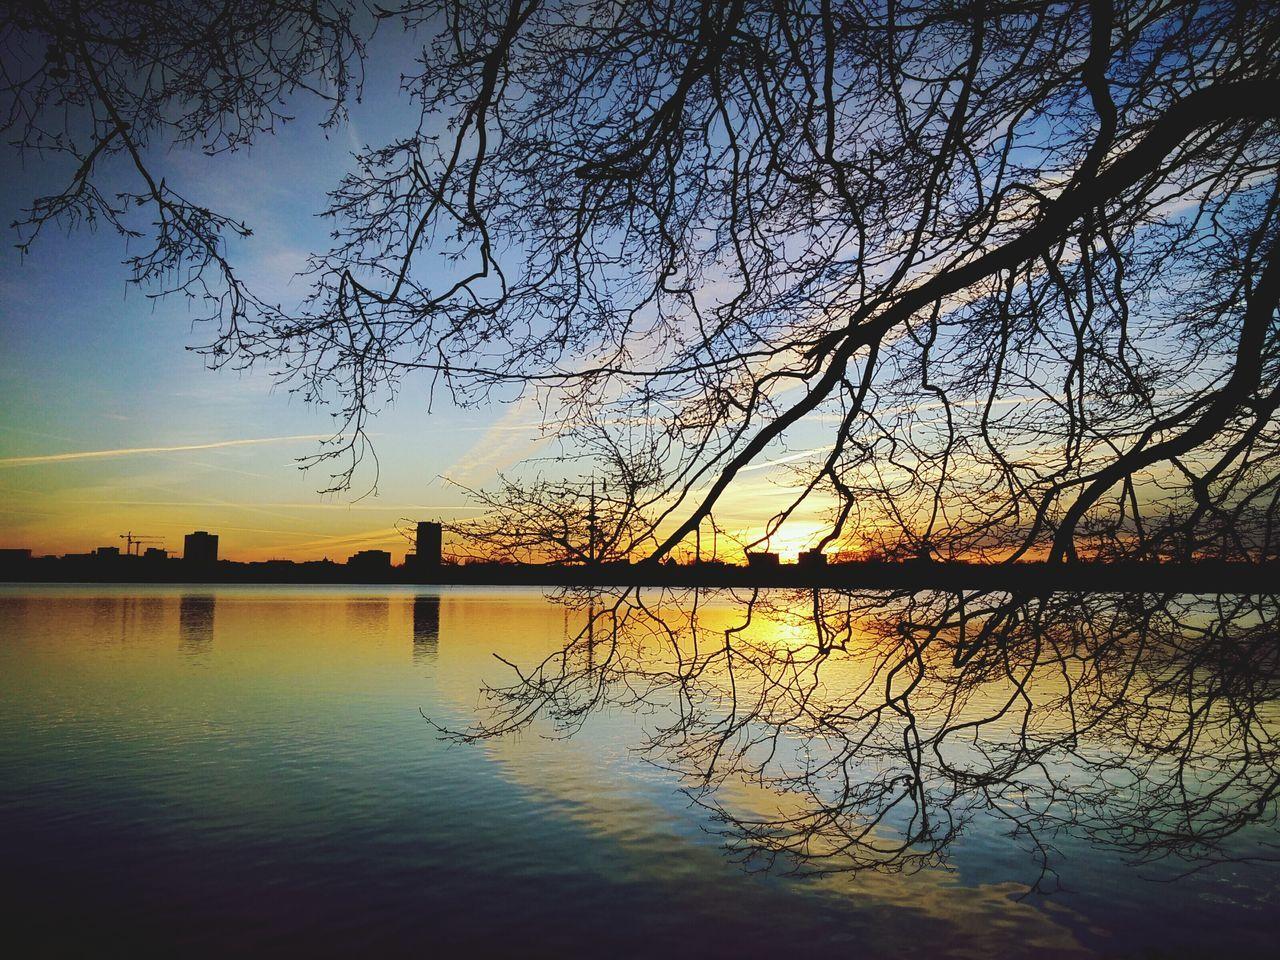 Silhouette Tree Over Lake Against Sky At Dusk